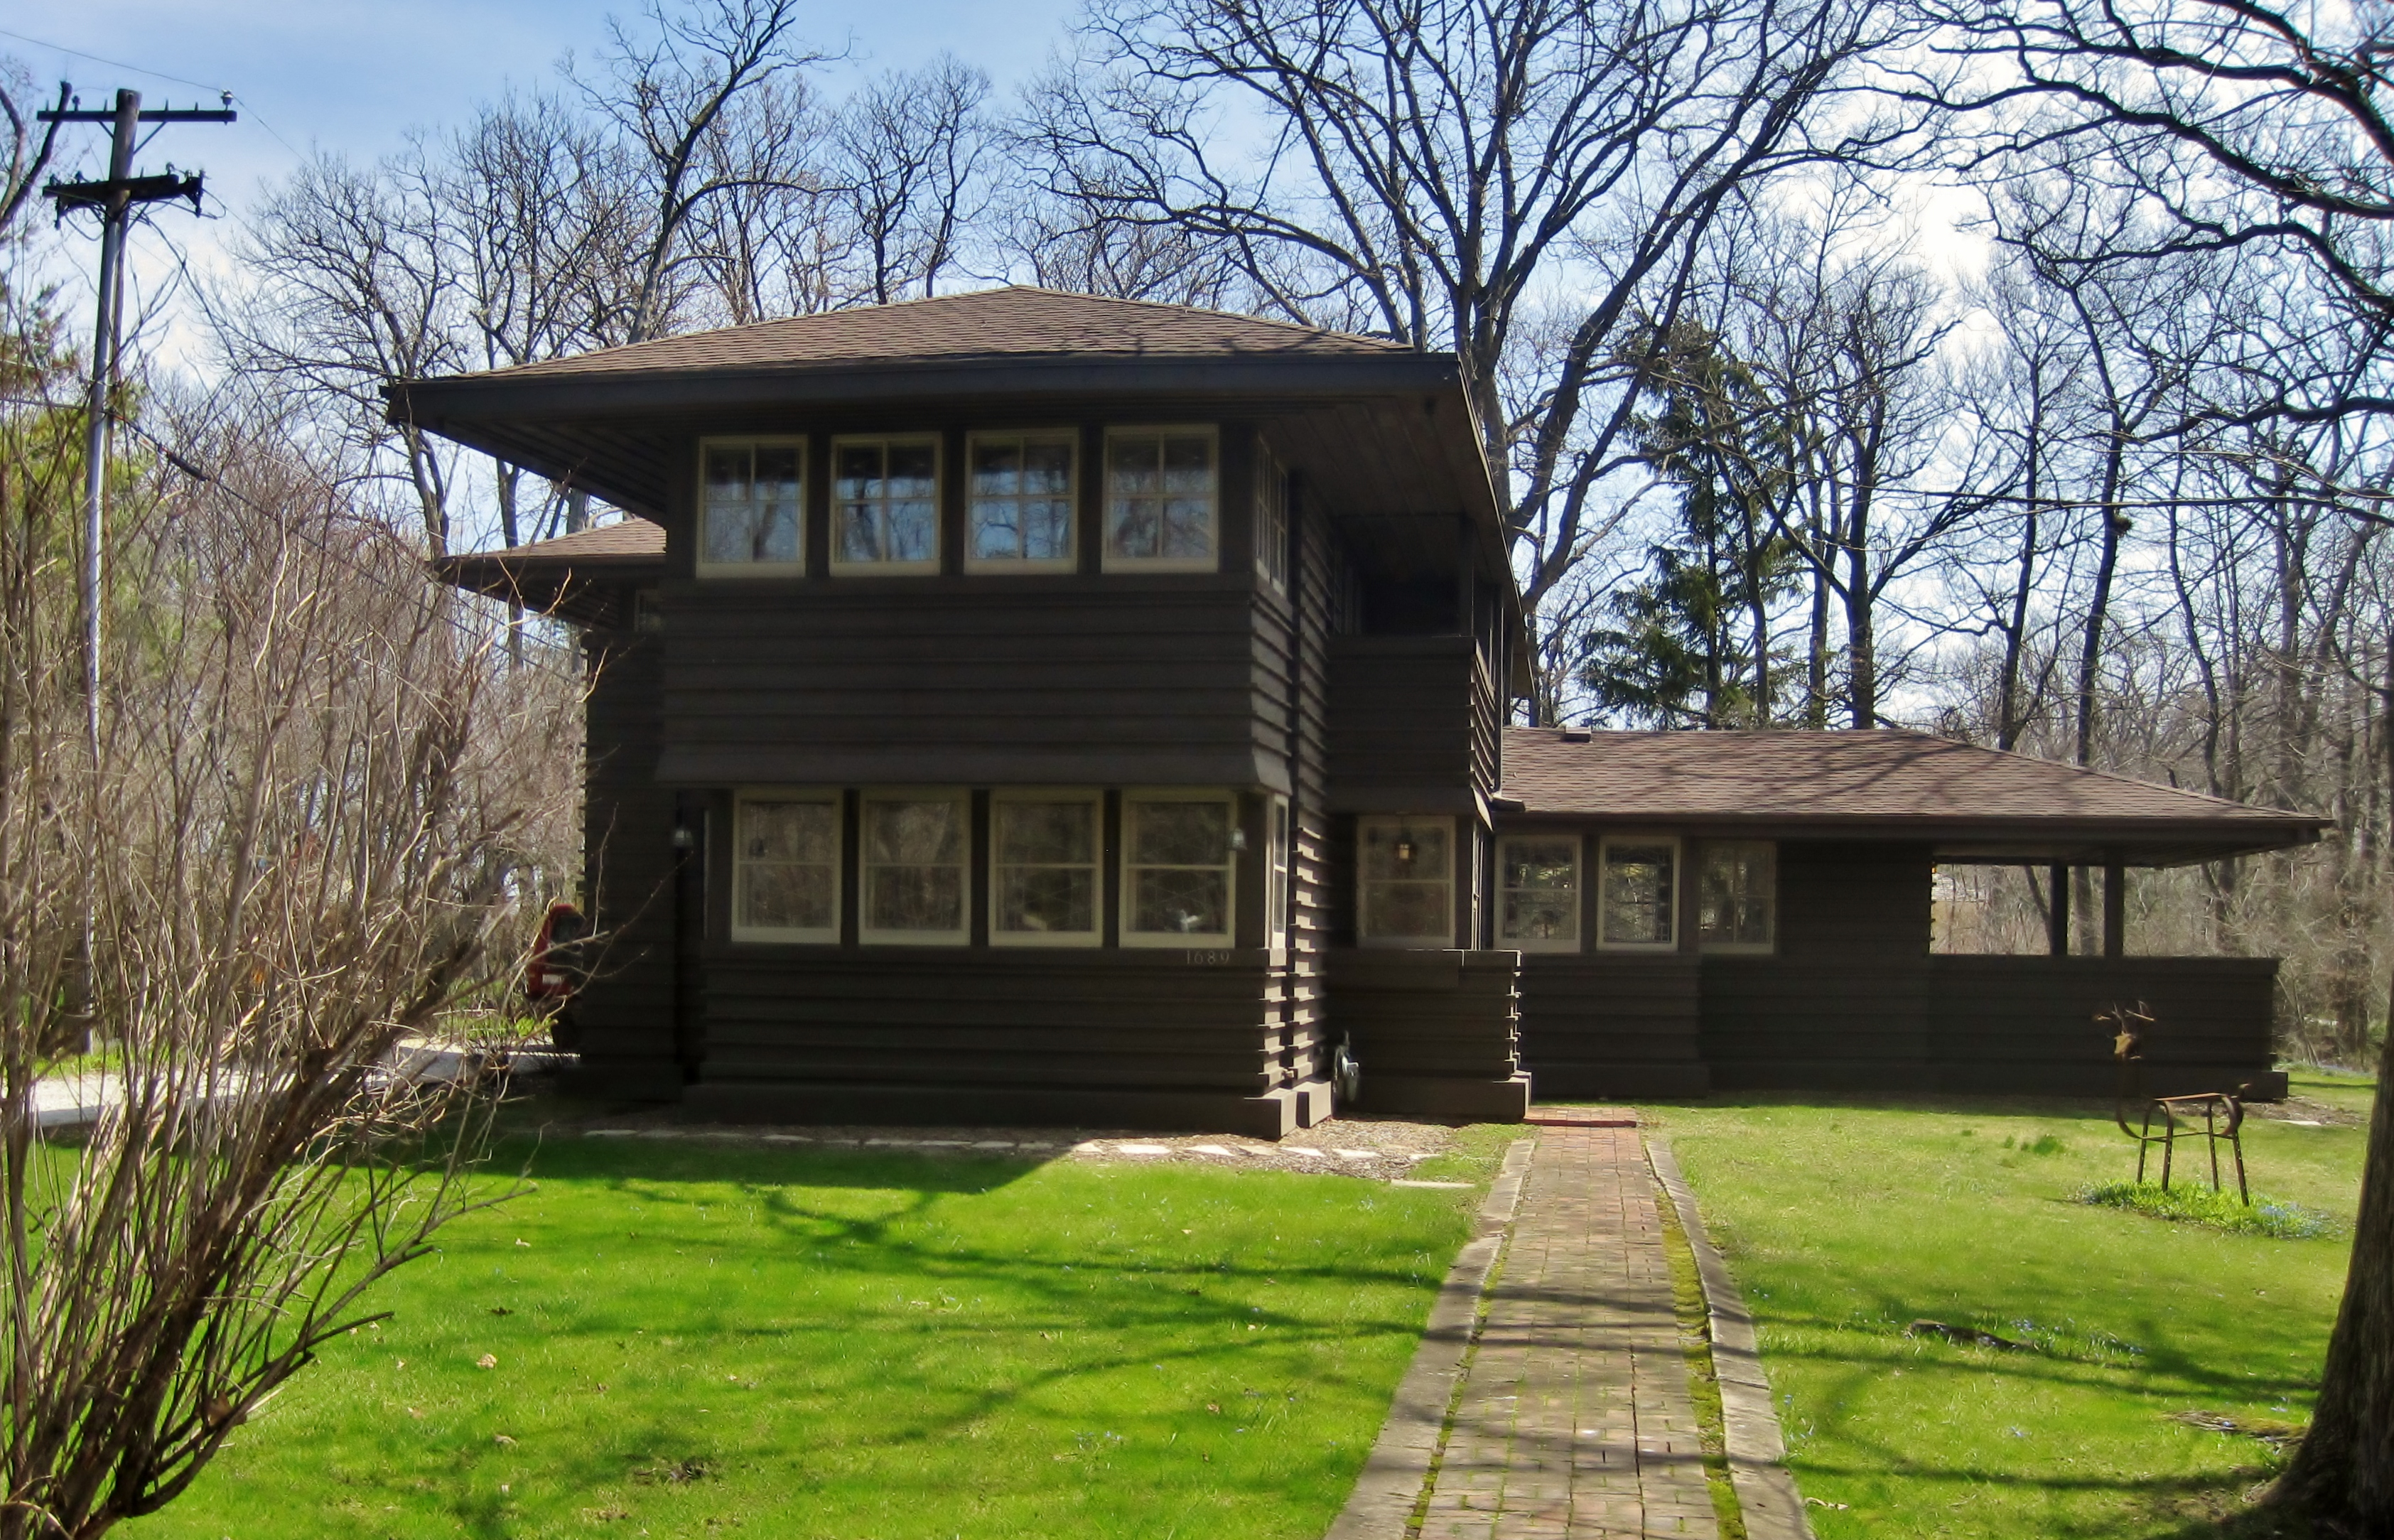 Millard House file:george madison millard house (8702672255) - wikimedia commons